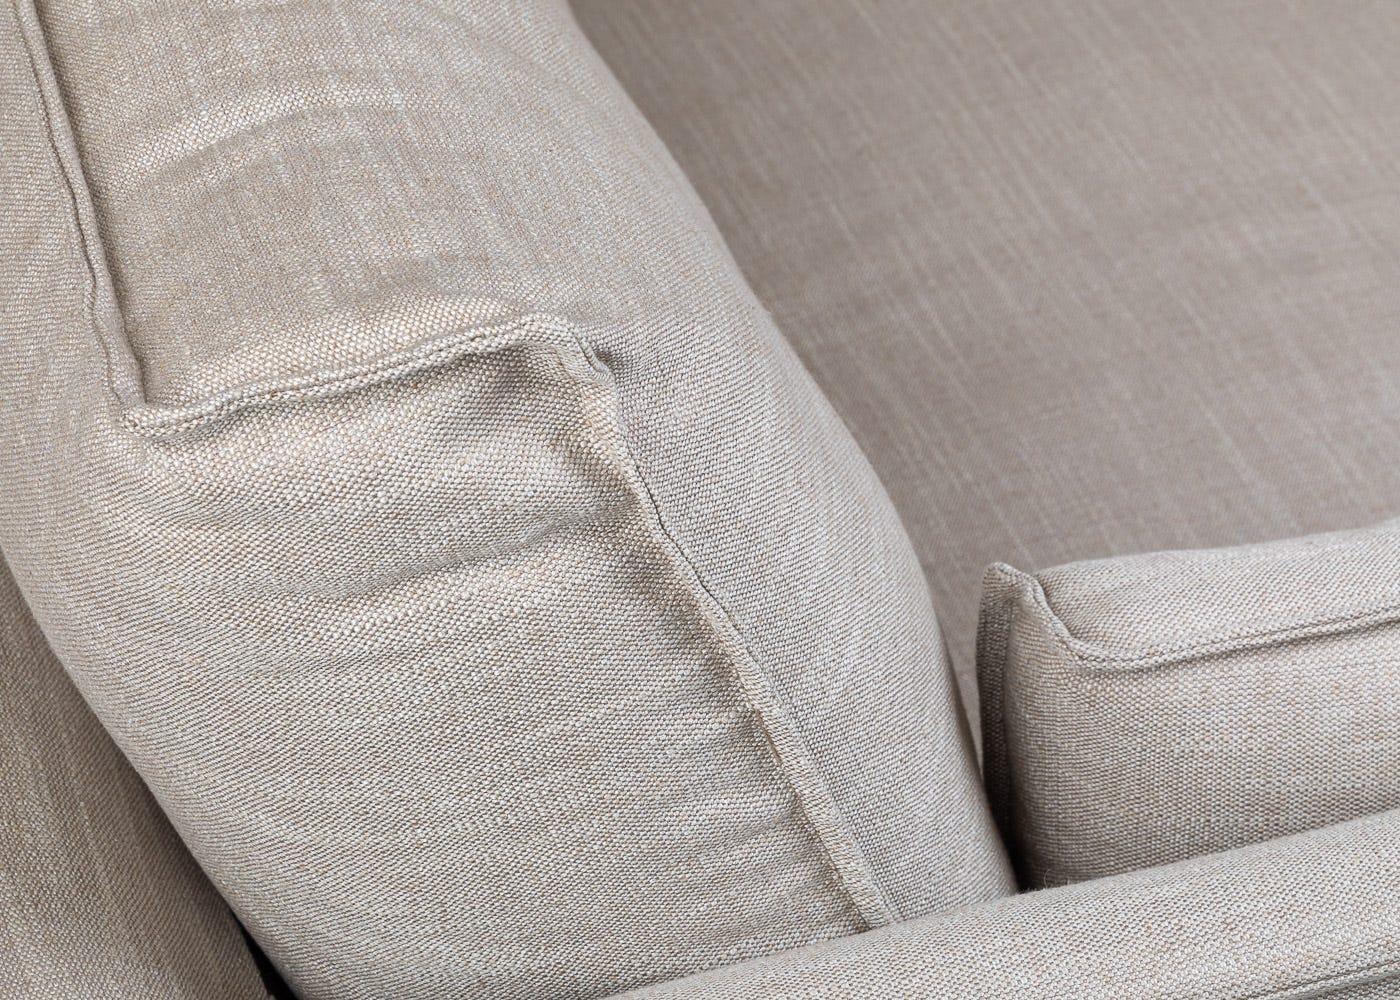 Tortona 4 Seater Sofa in Broad Weave Putty - Cushion